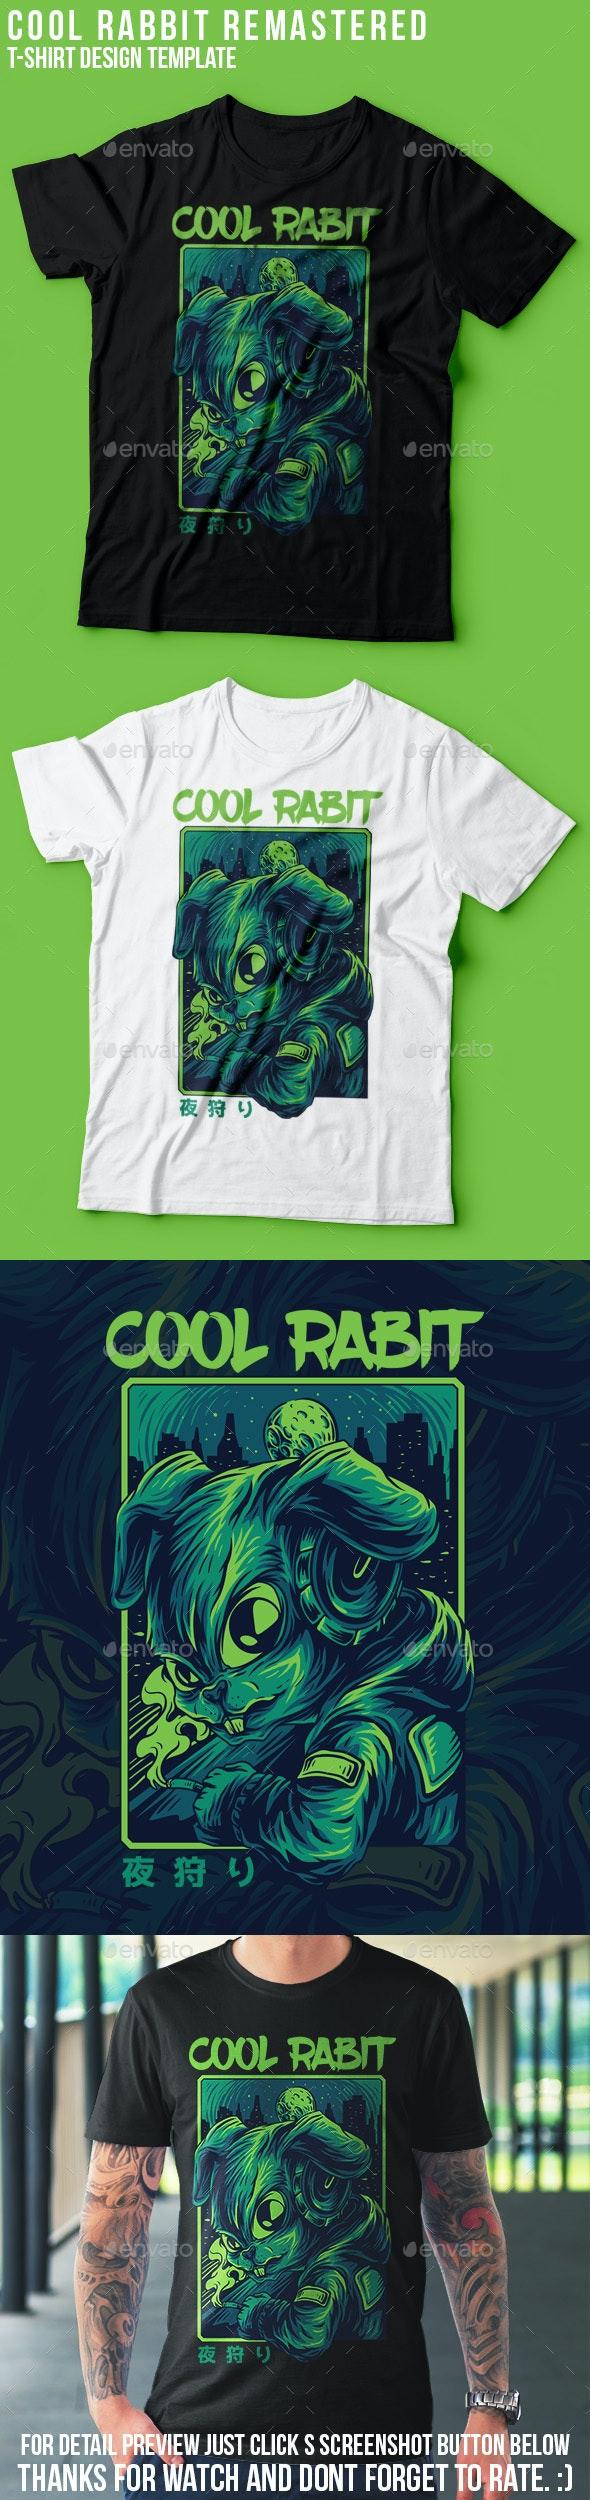 Cool Rabbit Remastered T-Shirt Design - Events T-Shirts